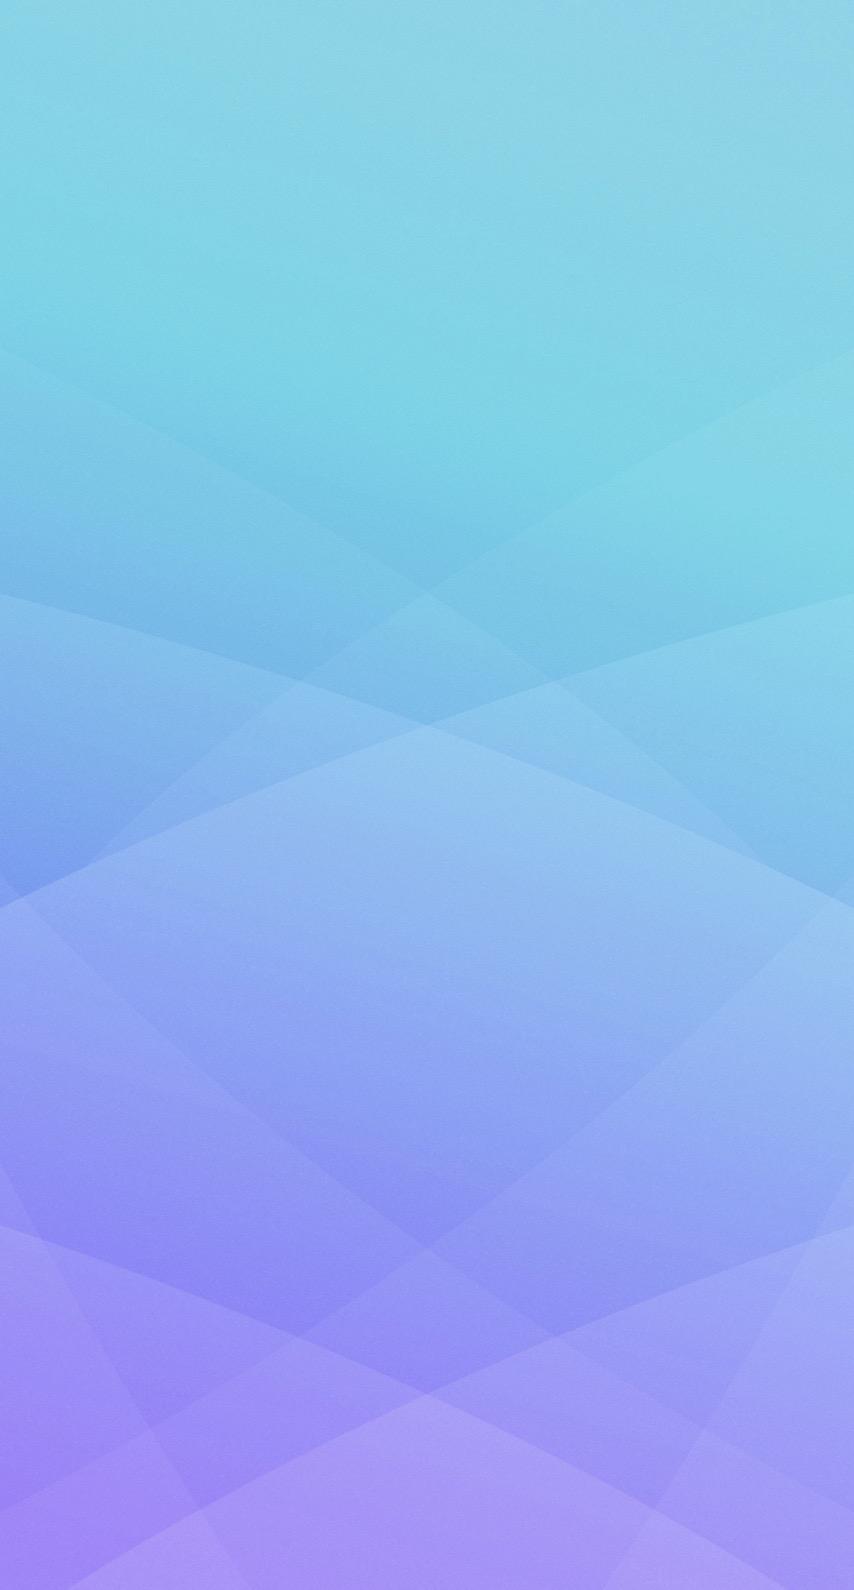 200 Wallpaper Biru Dan Ungu HD Gratis